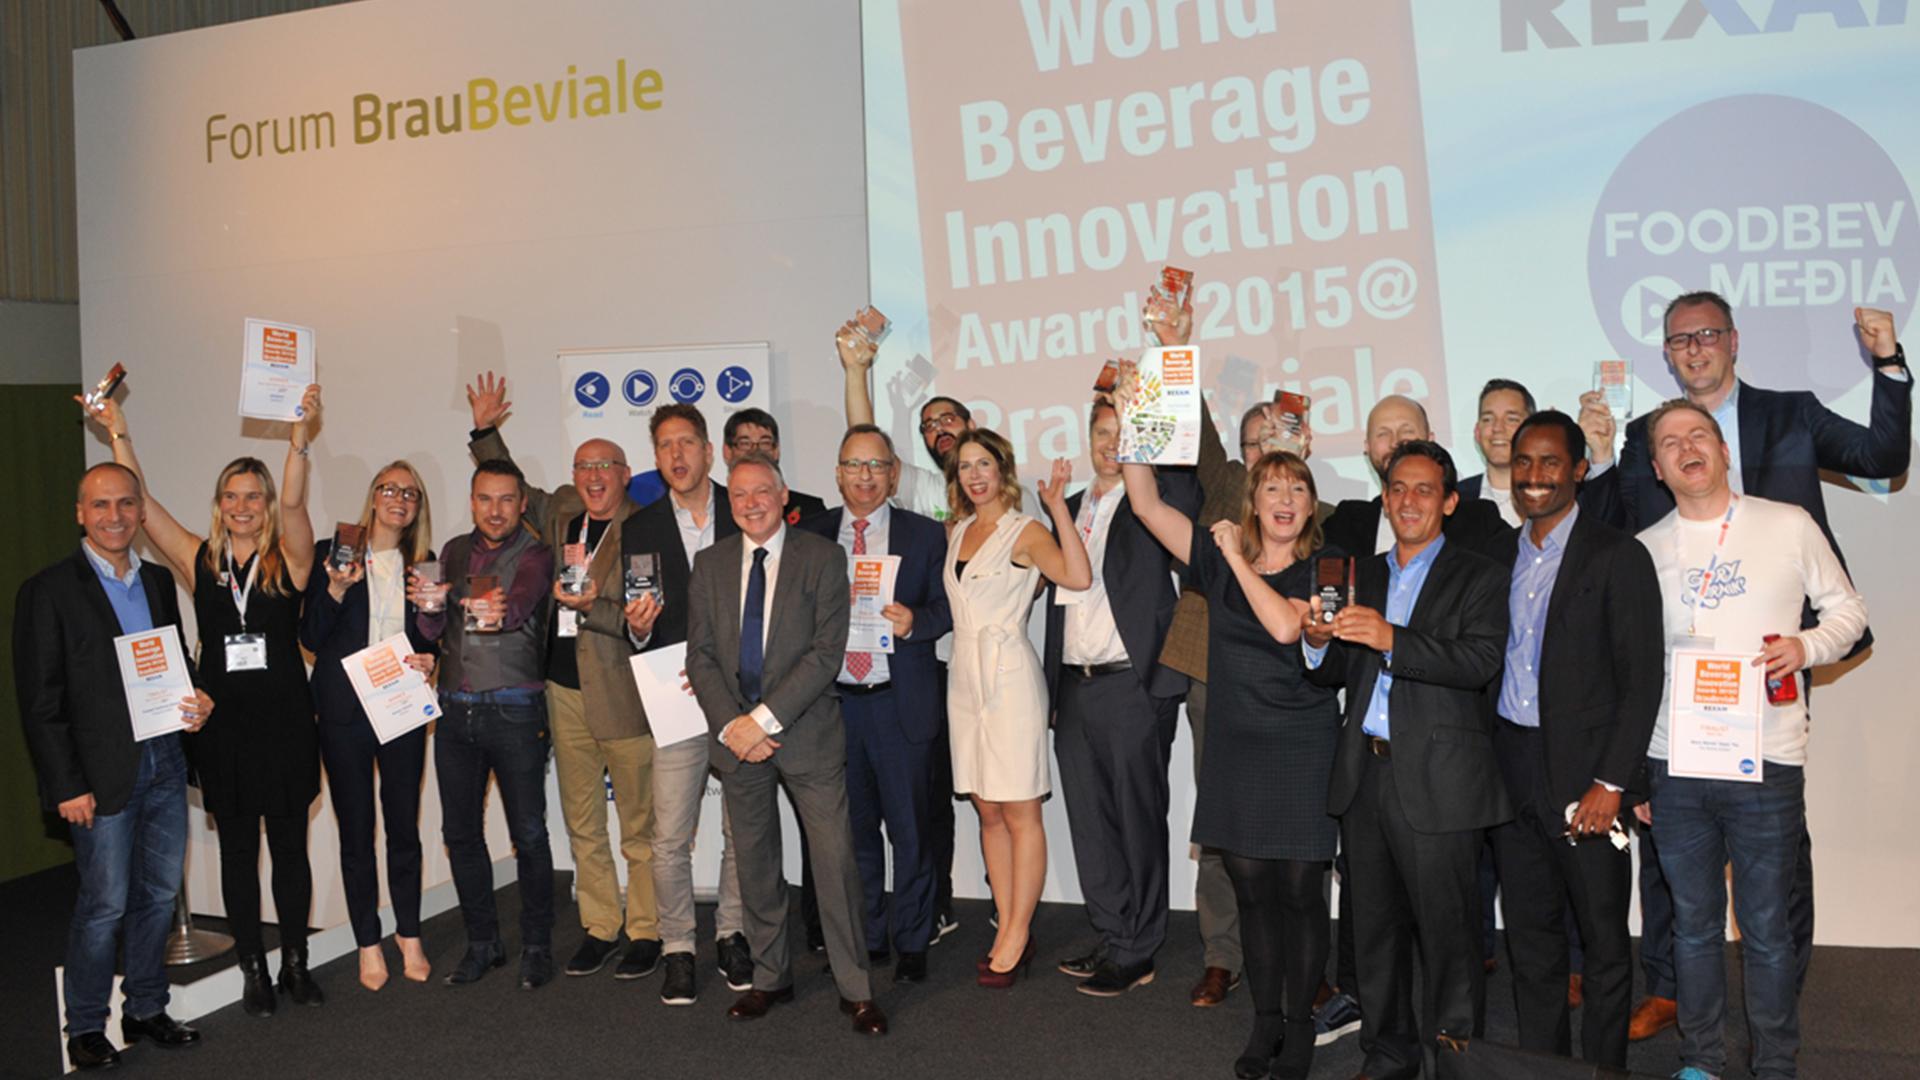 SipSmart Cap Wins 1st Place at World Beverage Innovation Awards